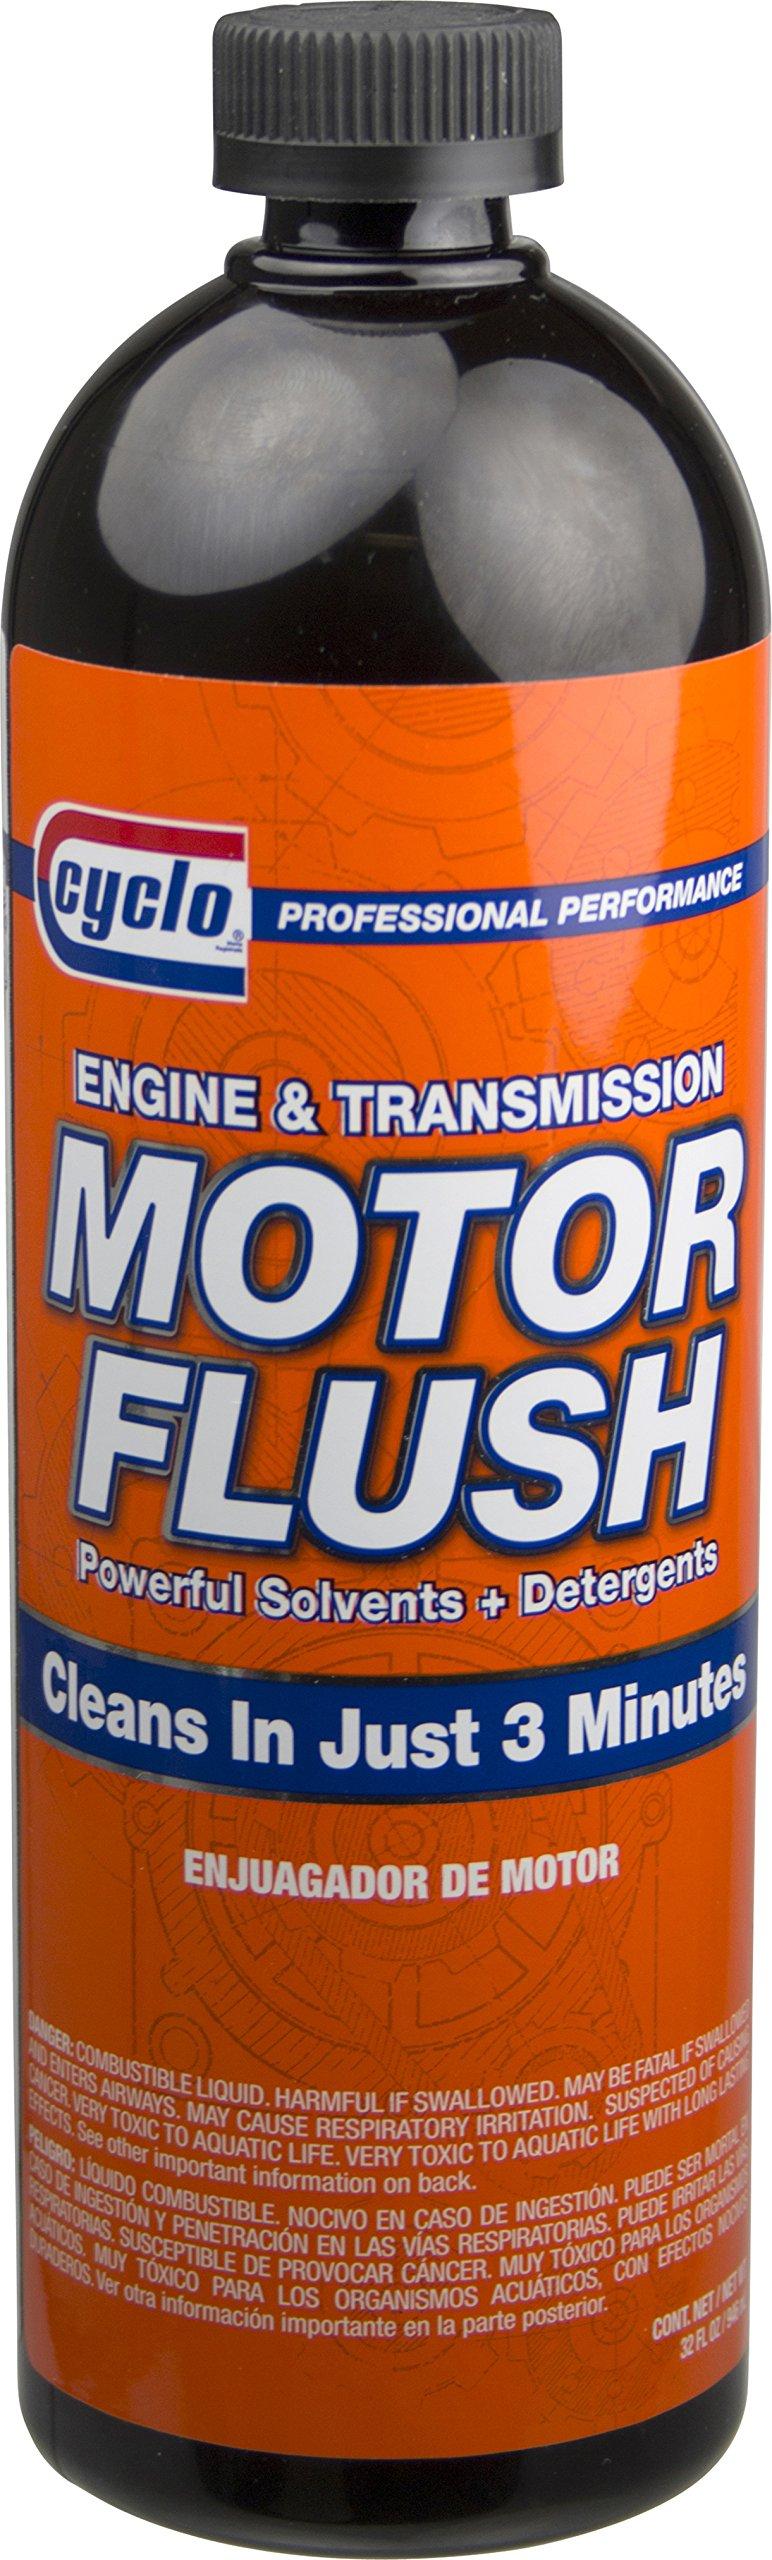 Niteo Cyclo Motor Flush: Engine & Transmission Cleaner, 30 fl oz